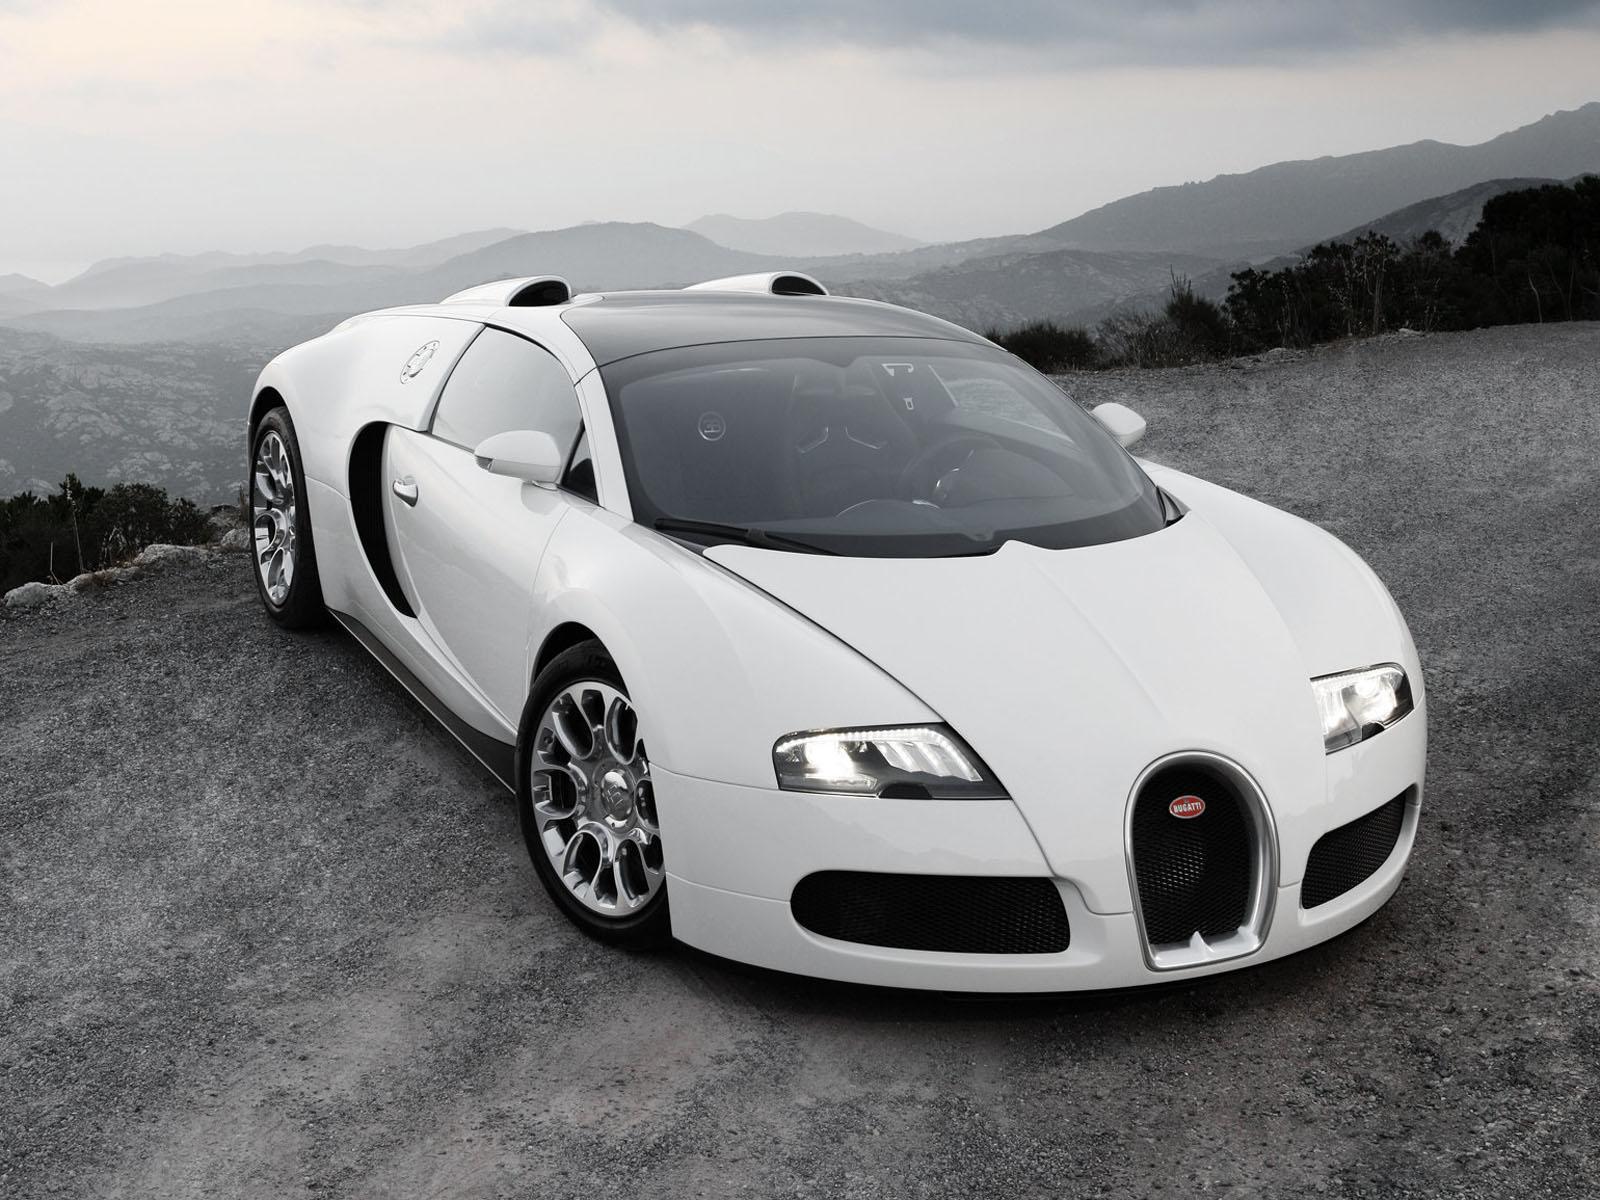 New Car Photo: white bugatti veyron wallpaper